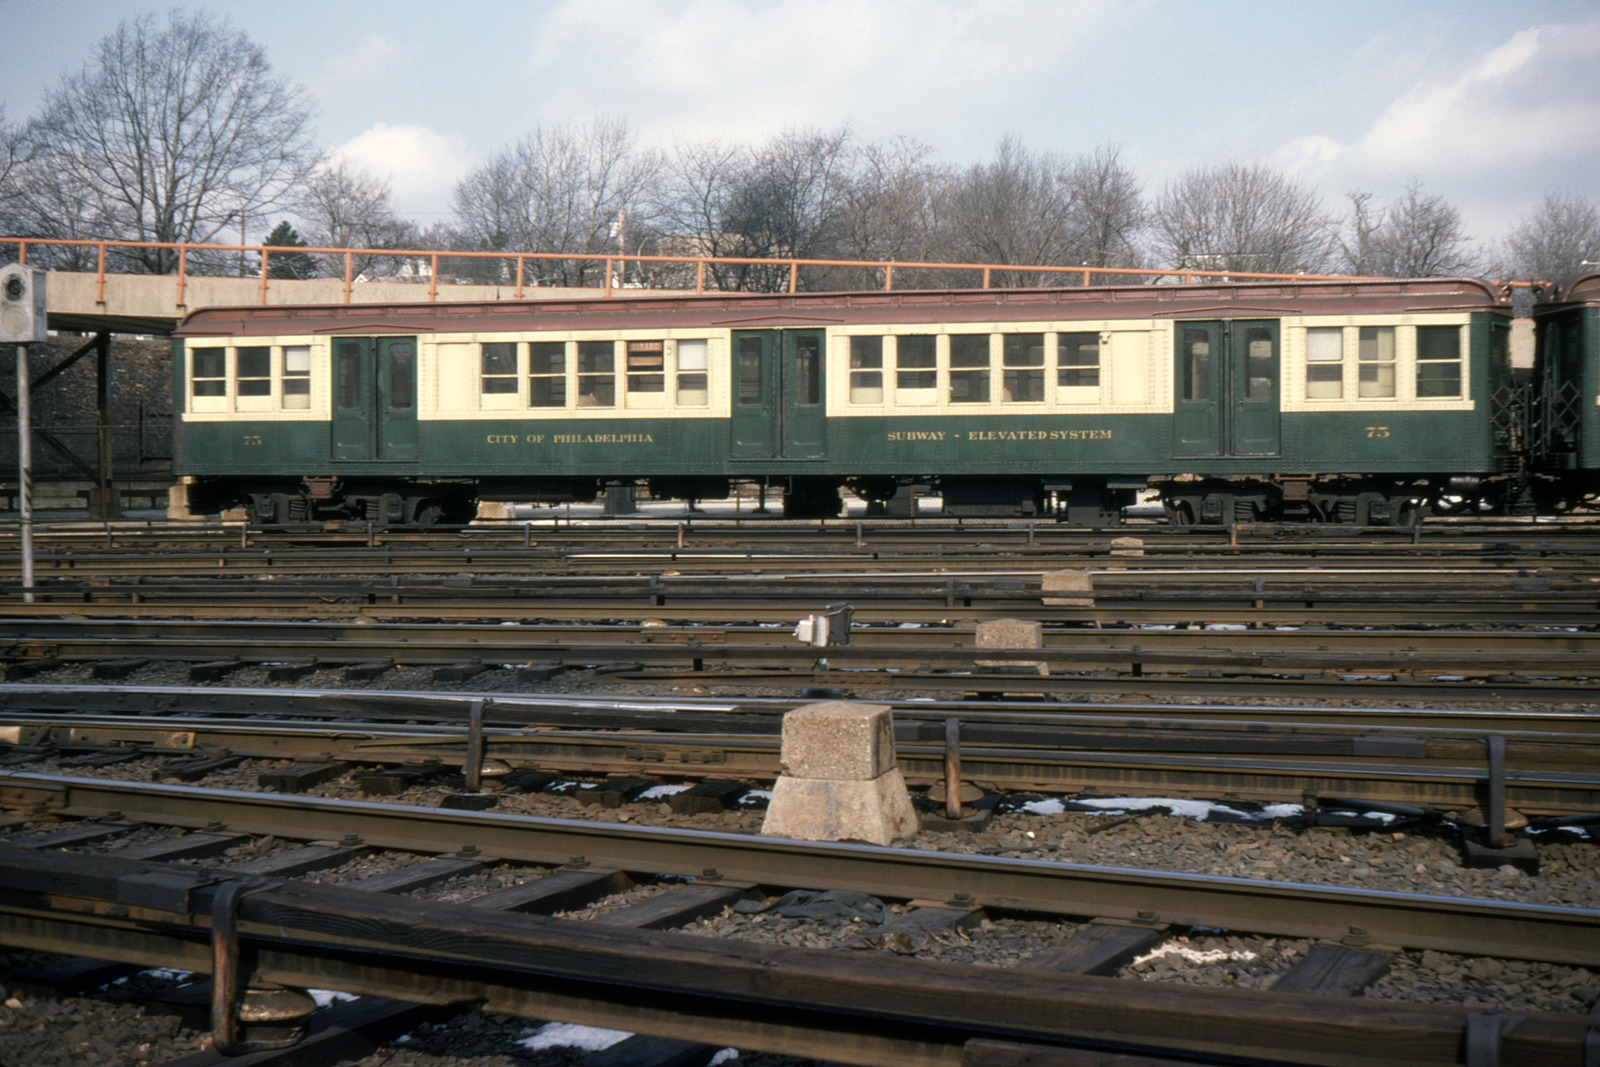 (586k, 1600x1067)<br><b>Country:</b> United States<br><b>City:</b> Philadelphia, PA<br><b>System:</b> SEPTA (or Predecessor)<br><b>Line:</b> Broad Street Subway<br><b>Location:</b> Fern Rock Yard/Shops<br><b>Car:</b> PTC/SEPTA B-1 Broad Street (J.G. Brill, 1927-1928) 75 <br><b>Photo by:</b> Ed Davis, Sr.<br><b>Collection of:</b> David Pirmann<br><b>Date:</b> 2/4/1979<br><b>Viewed (this week/total):</b> 0 / 2080